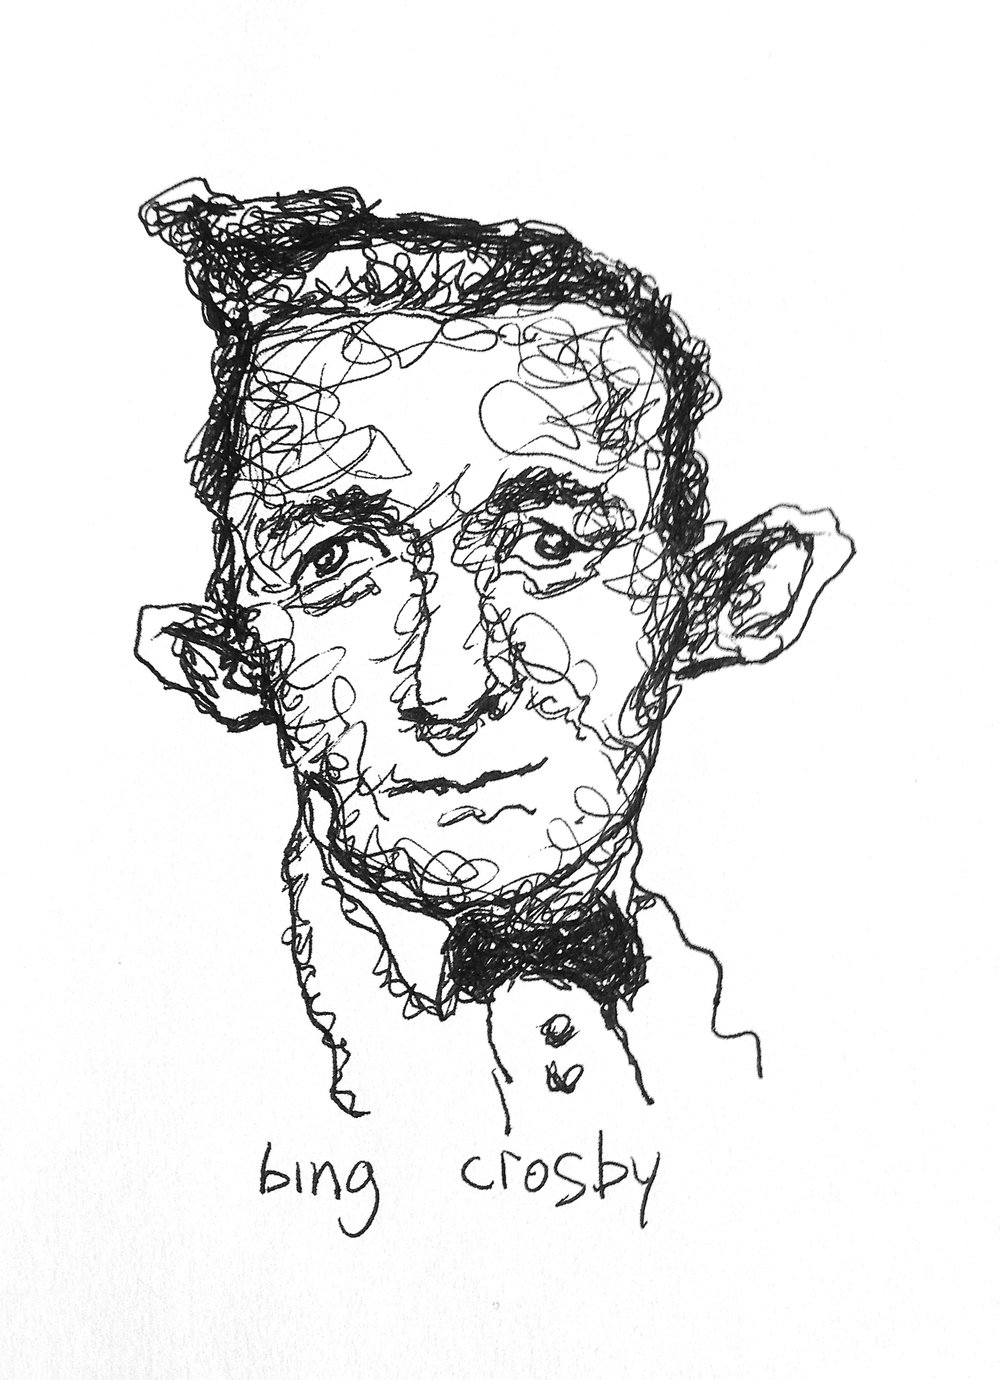 BingCrosby.JPG